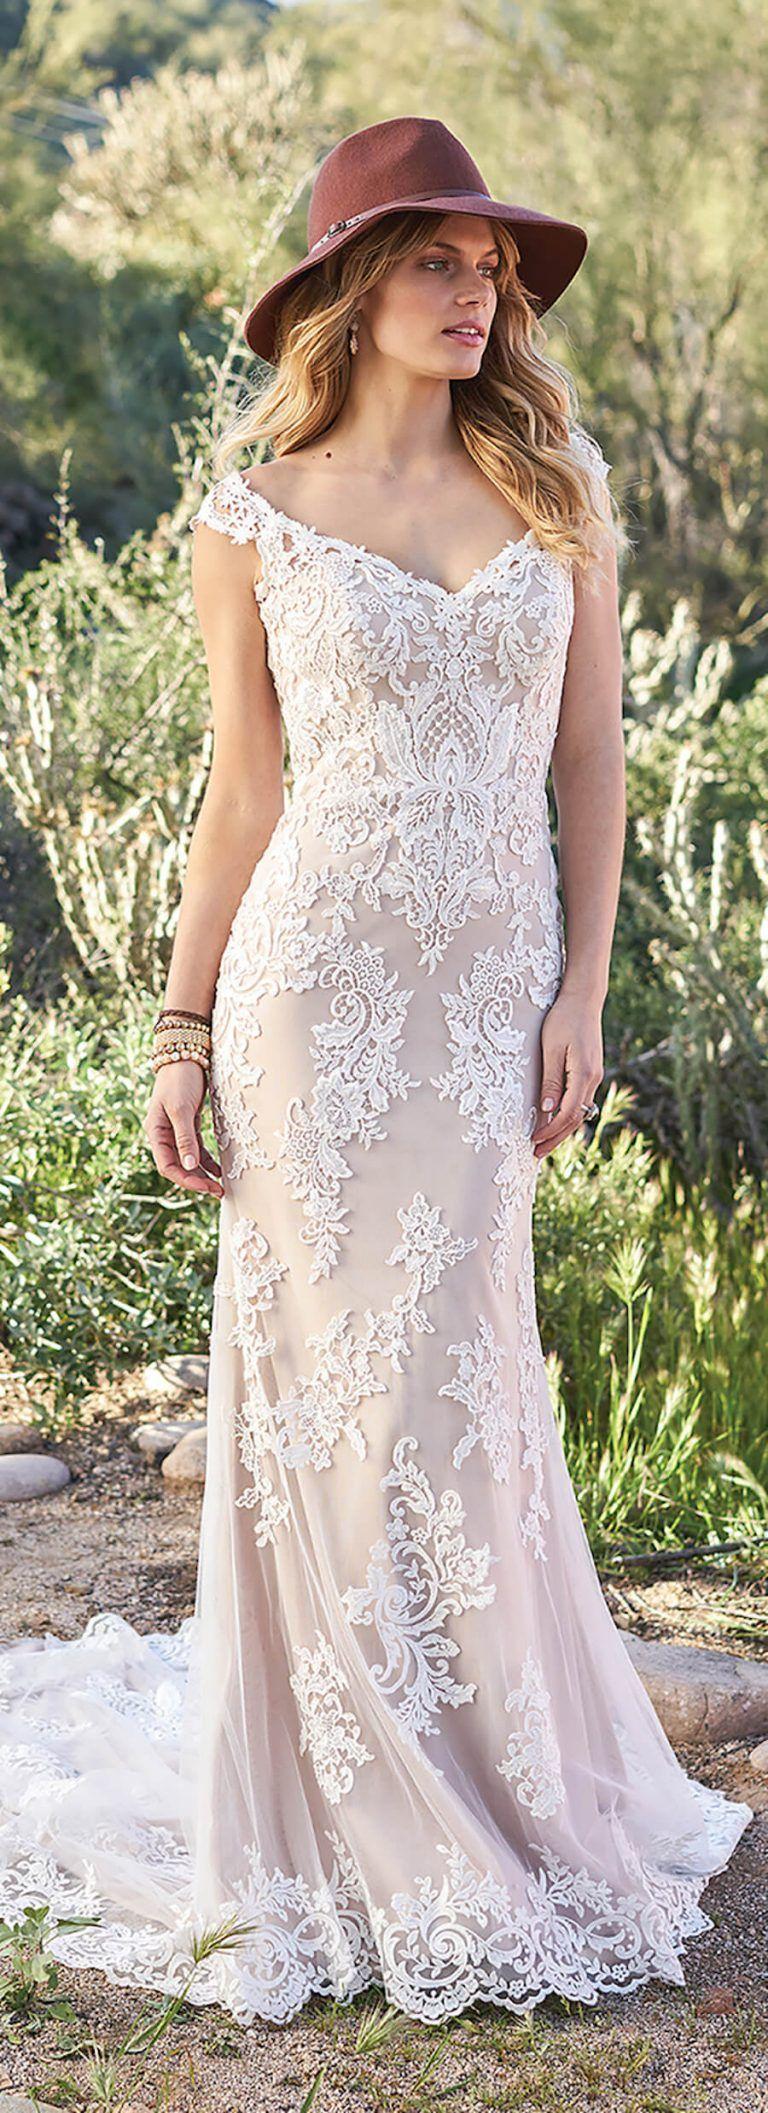 Lillian west wedding dress collection spring stunning